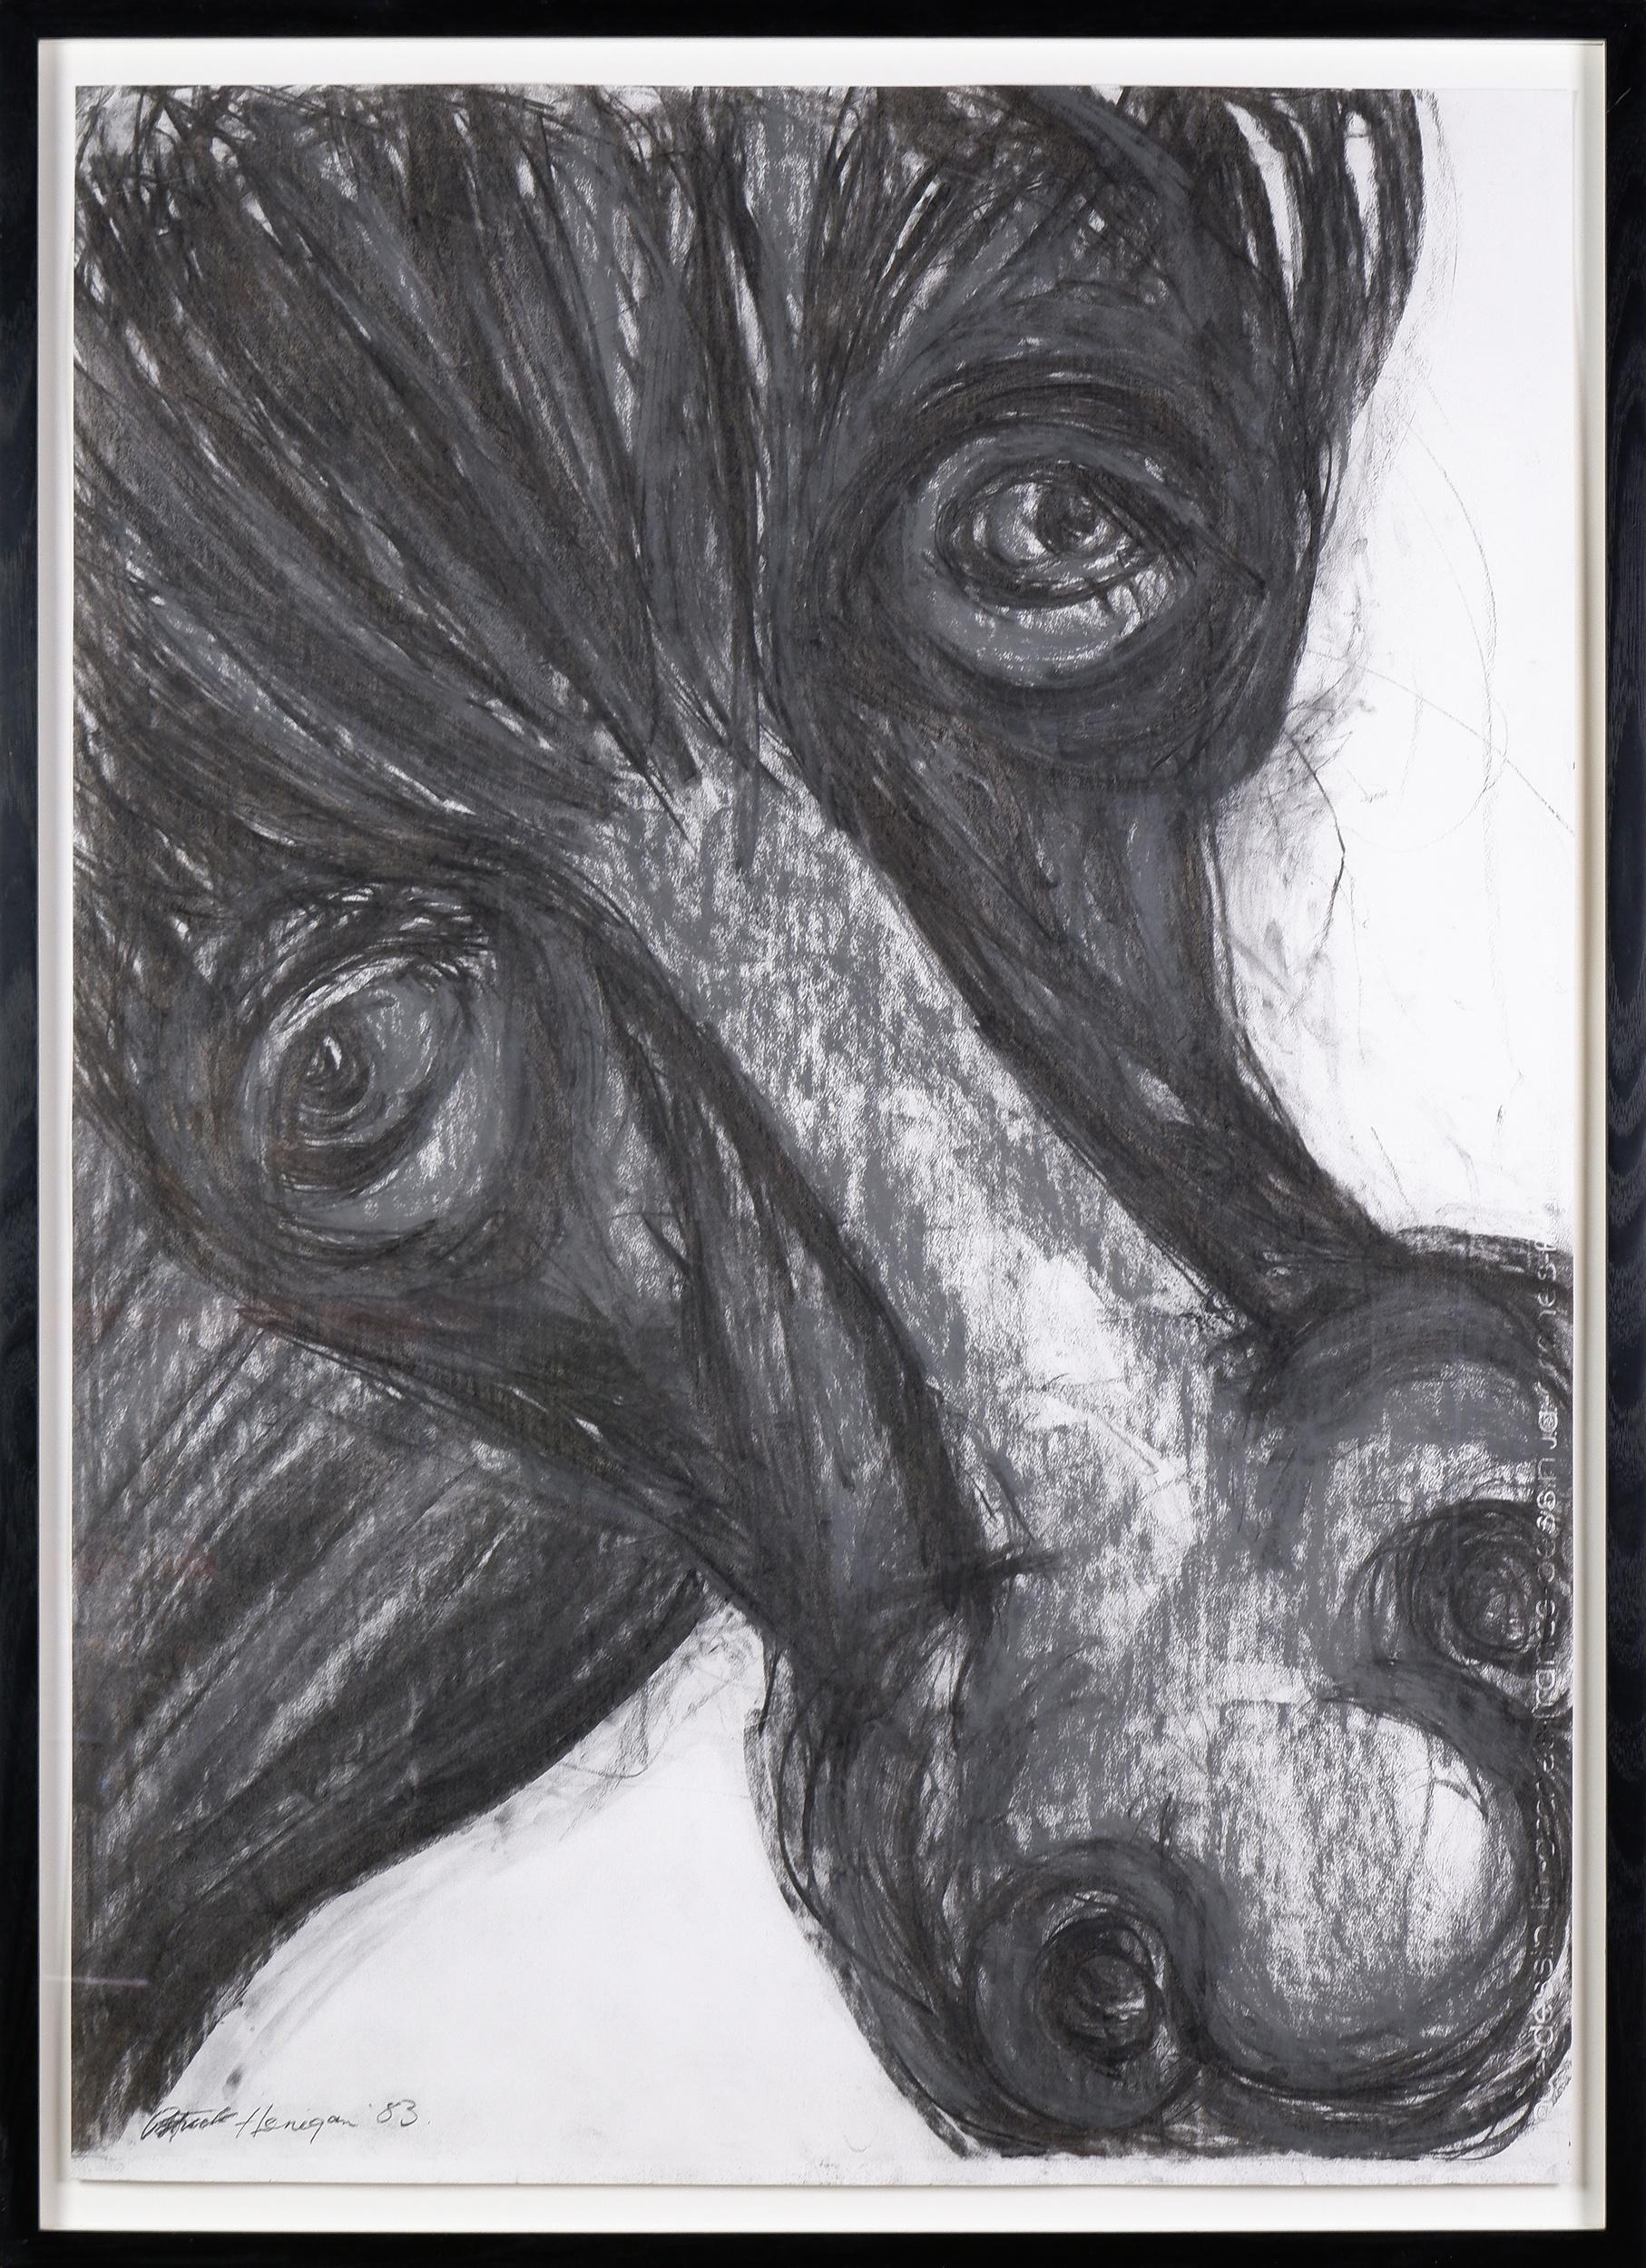 'Patrick Henigan (1925-2018), Horse 1983, Charcoal on Paper, 98 x 70 cm'